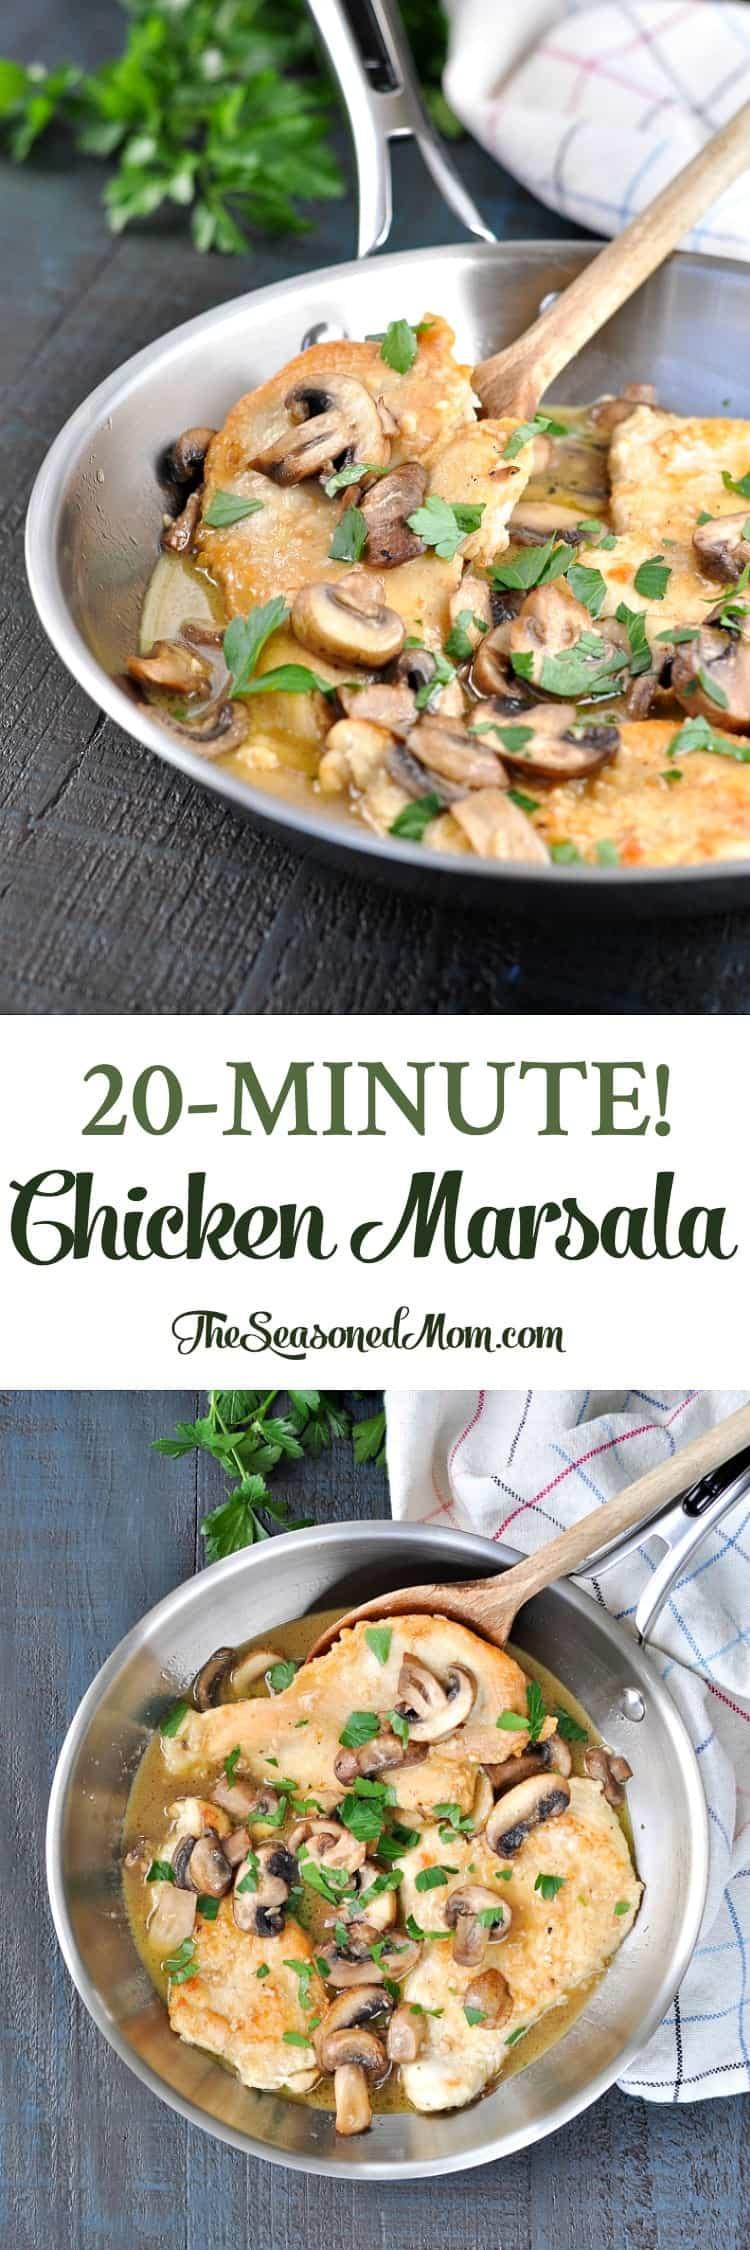 One Skillet 20-Minute Chicken Marsala! Easy Dinner Recipes | Dinner Ideas | Chicken Recipes | Chicken Breast Recipes | Dinner Recipes Easy